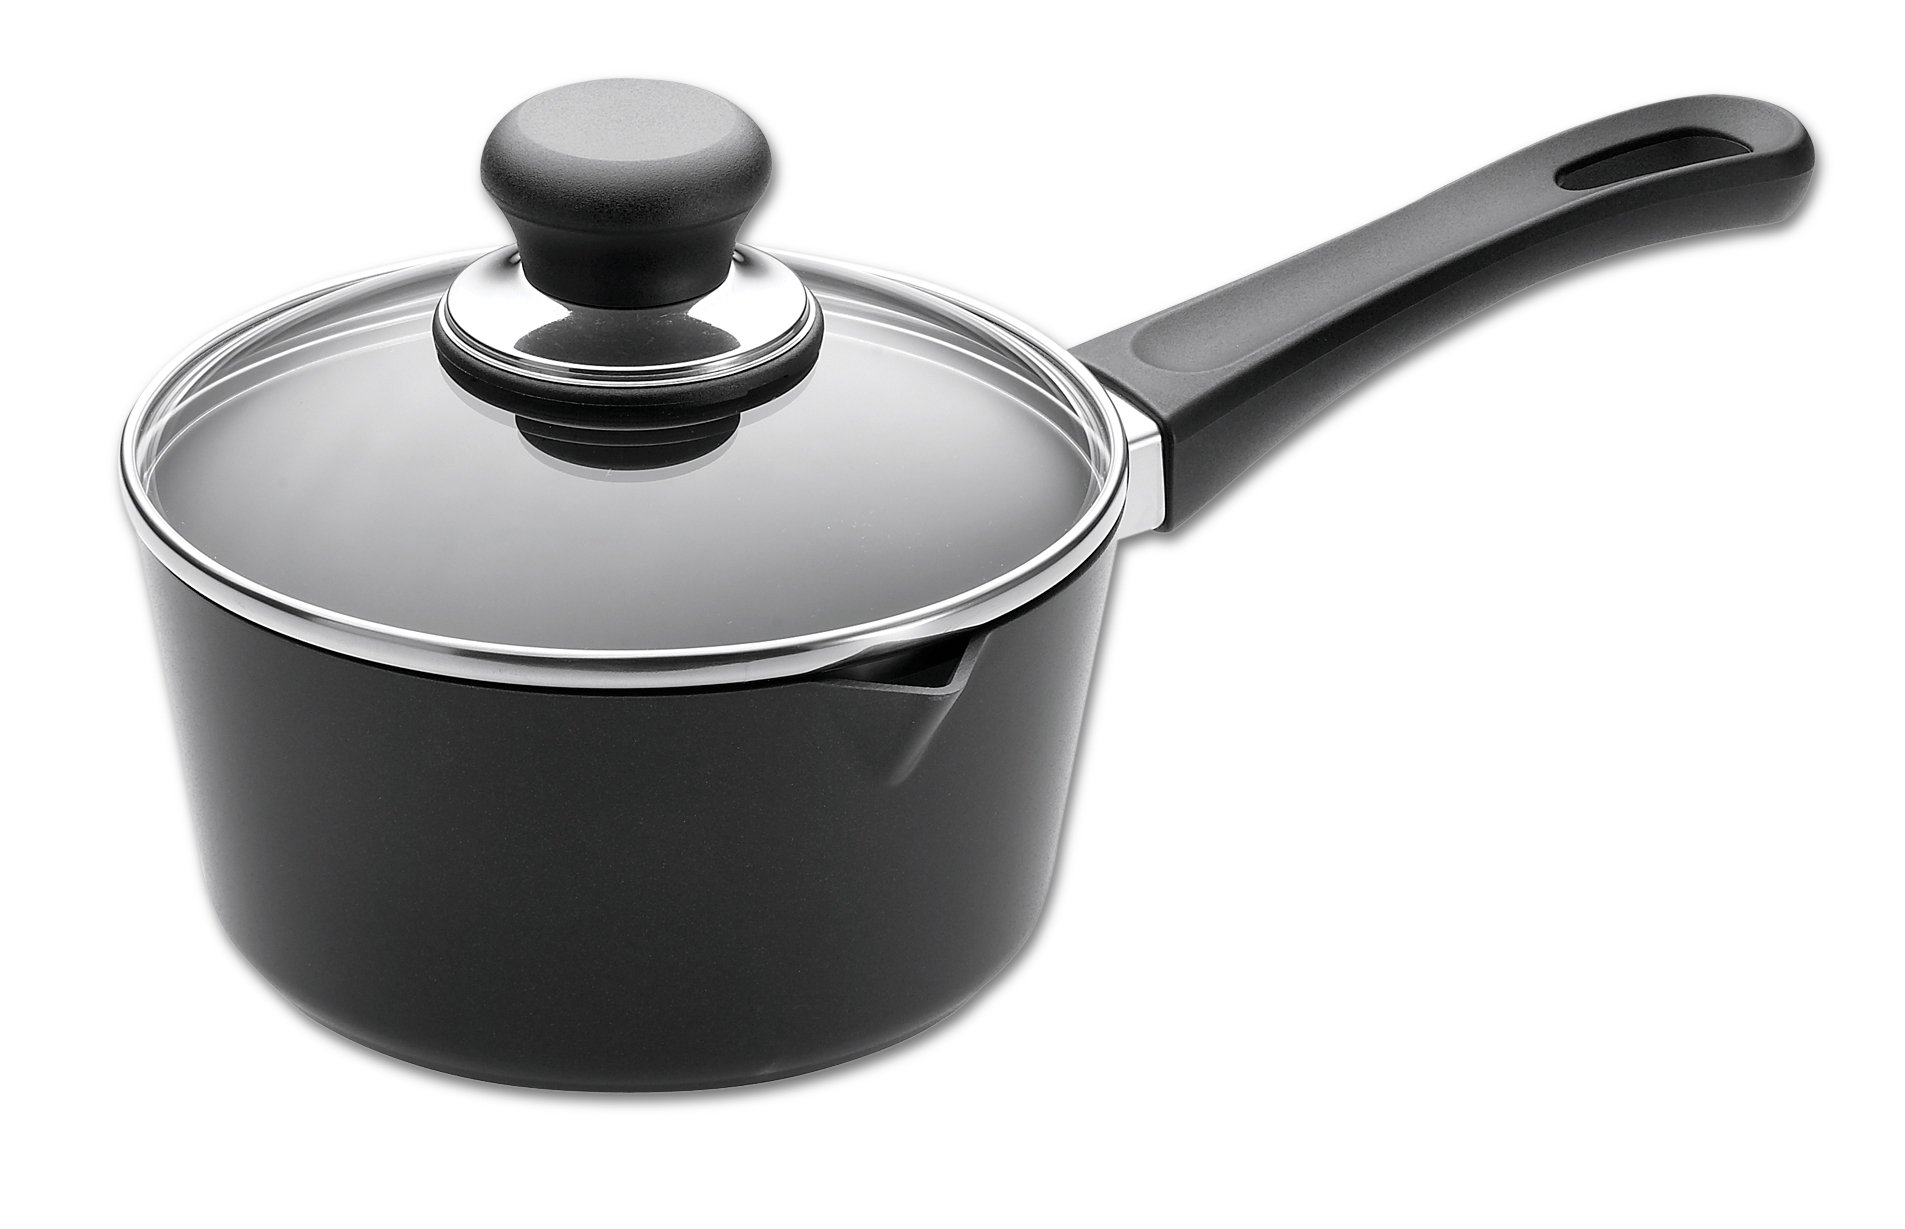 Scanpan Classic 1.25-Quart Covered Saucepan